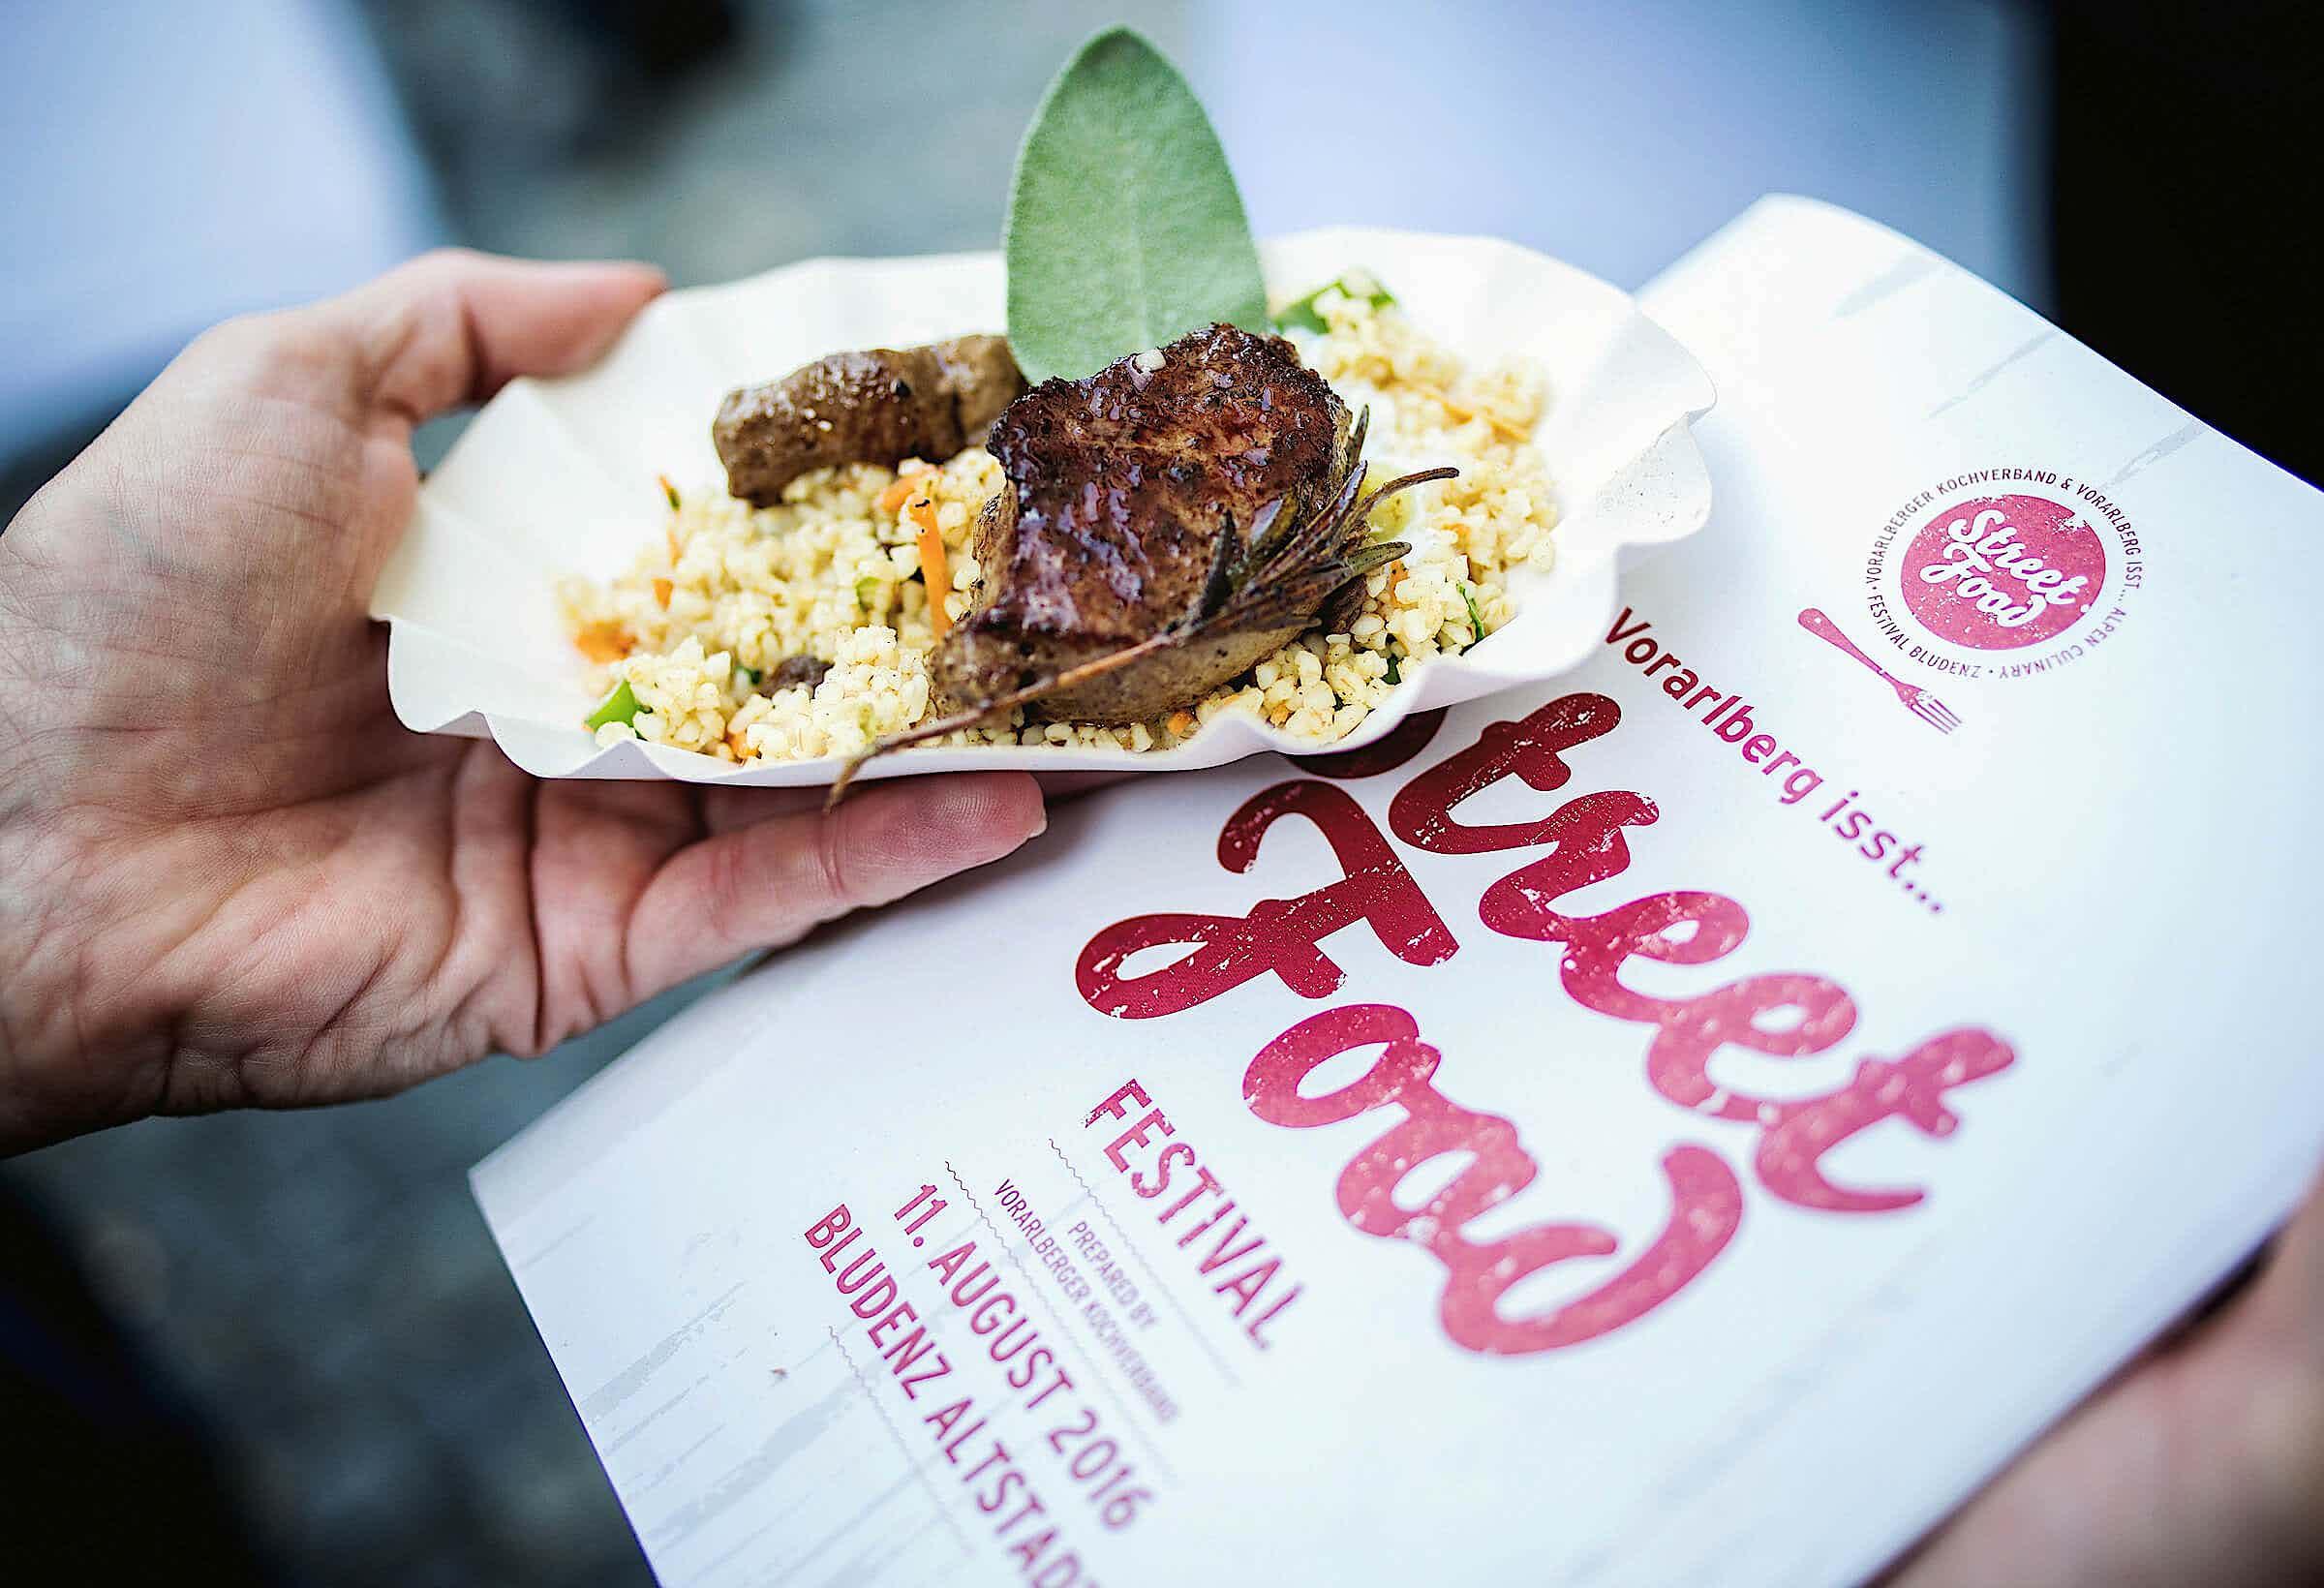 street food festival flyer und street food